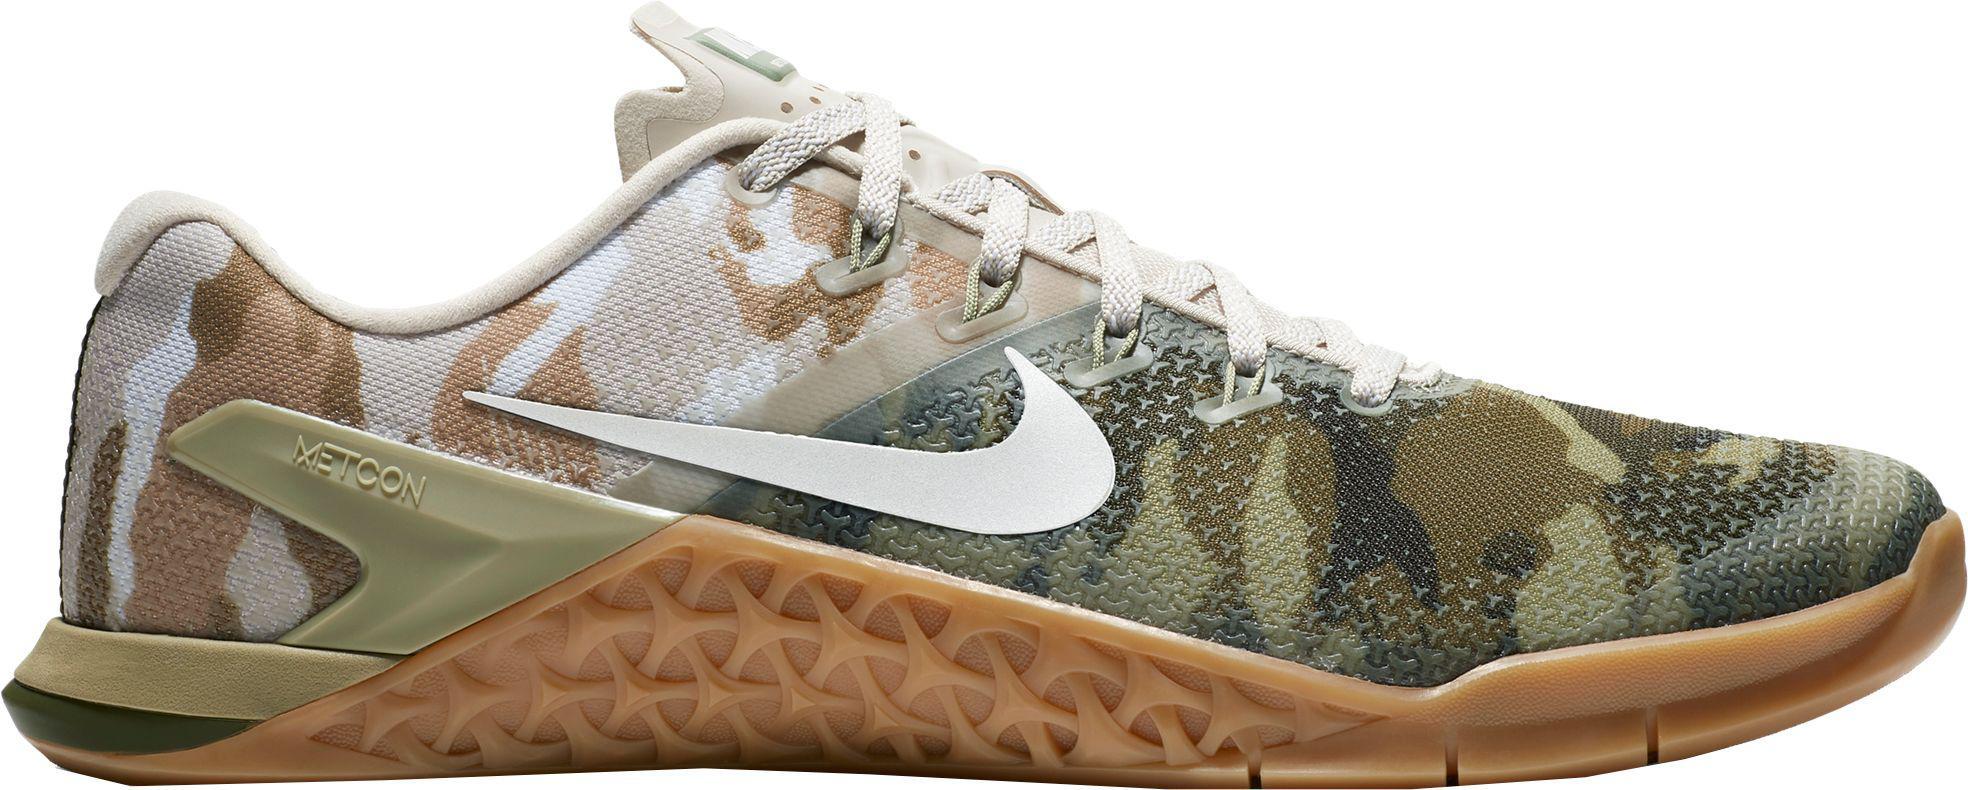 5eb0fef09e806 Nike - Multicolor Metcon 4 Training Shoes for Men - Lyst